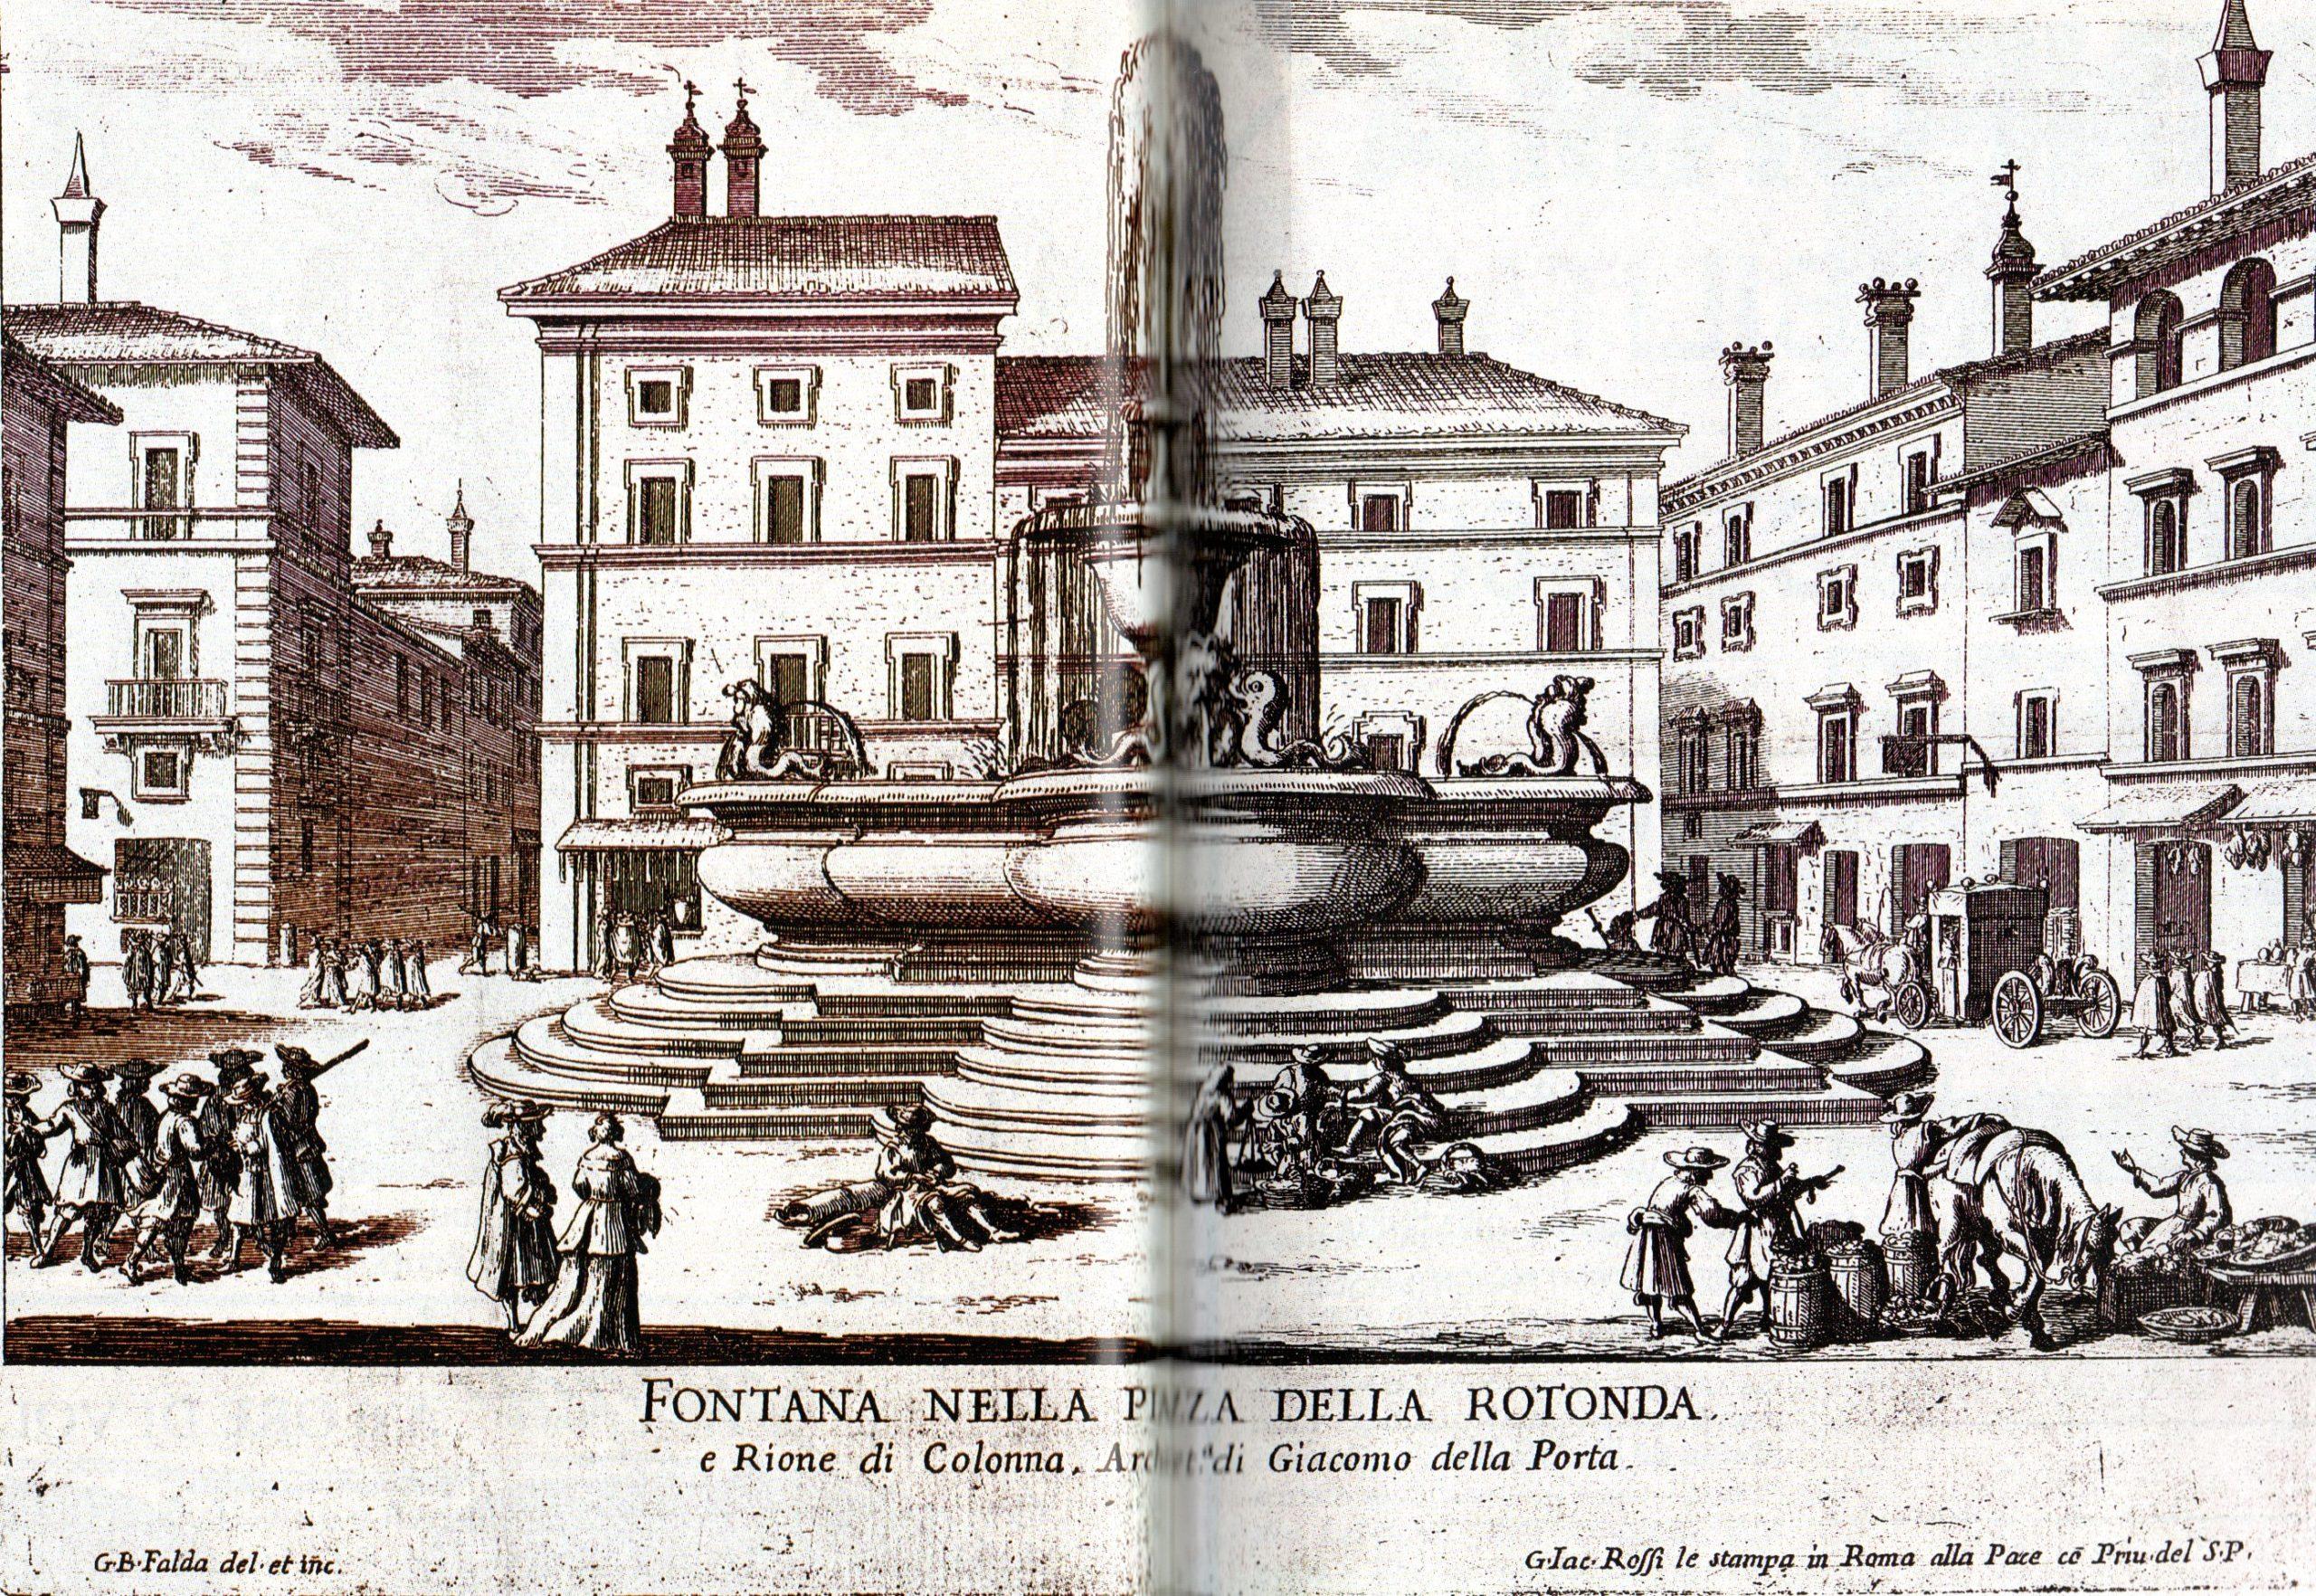 AVINEWS 289: L'HOTEL SOLE AL PANTHEON E I 5 VILLAGGI DI POSTER TOUR AI CARAIBI